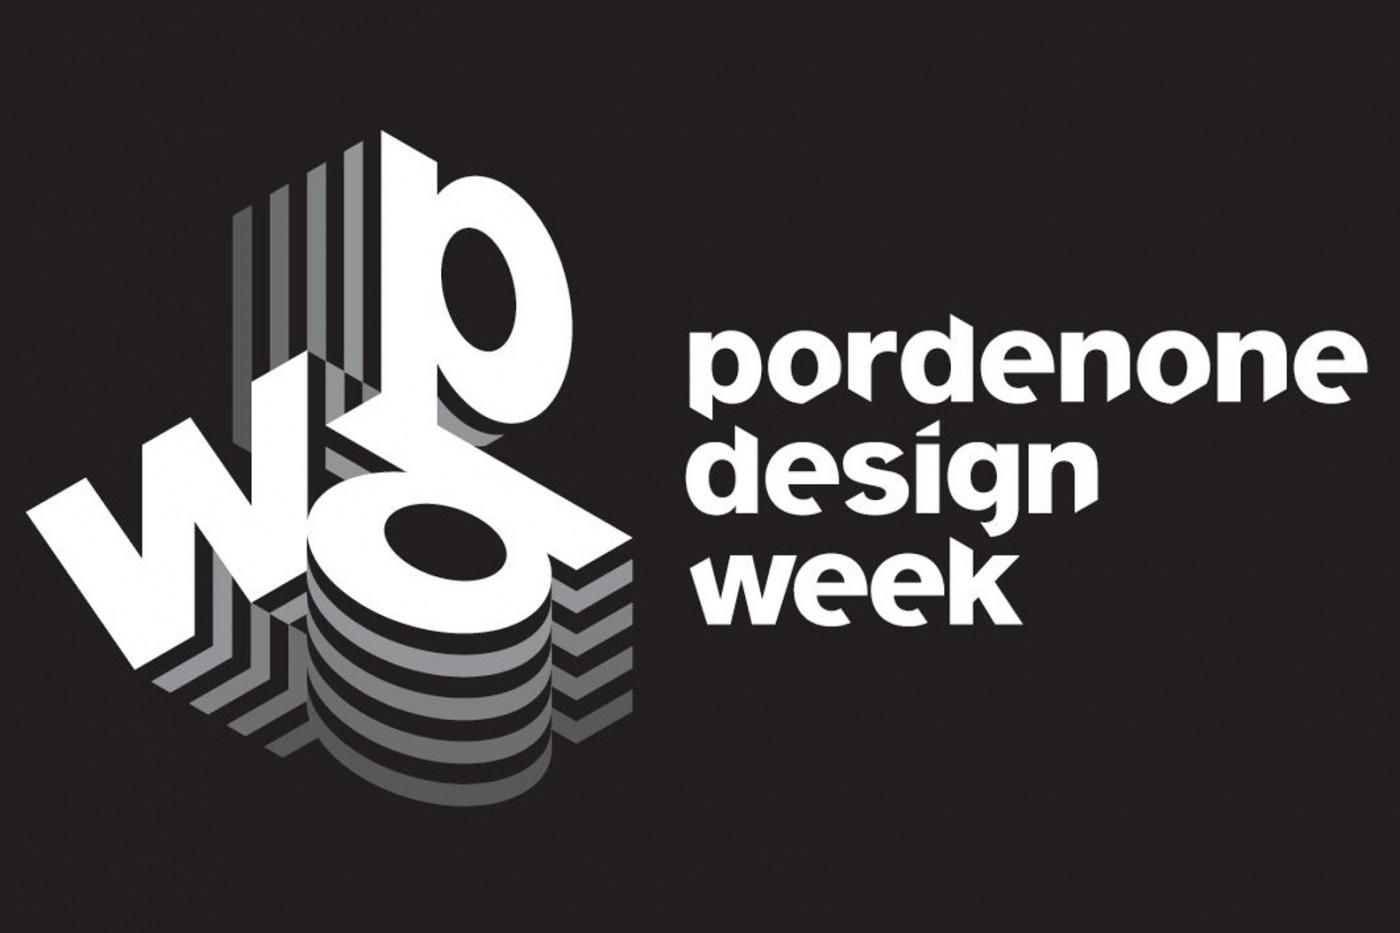 Pordenone Design Week